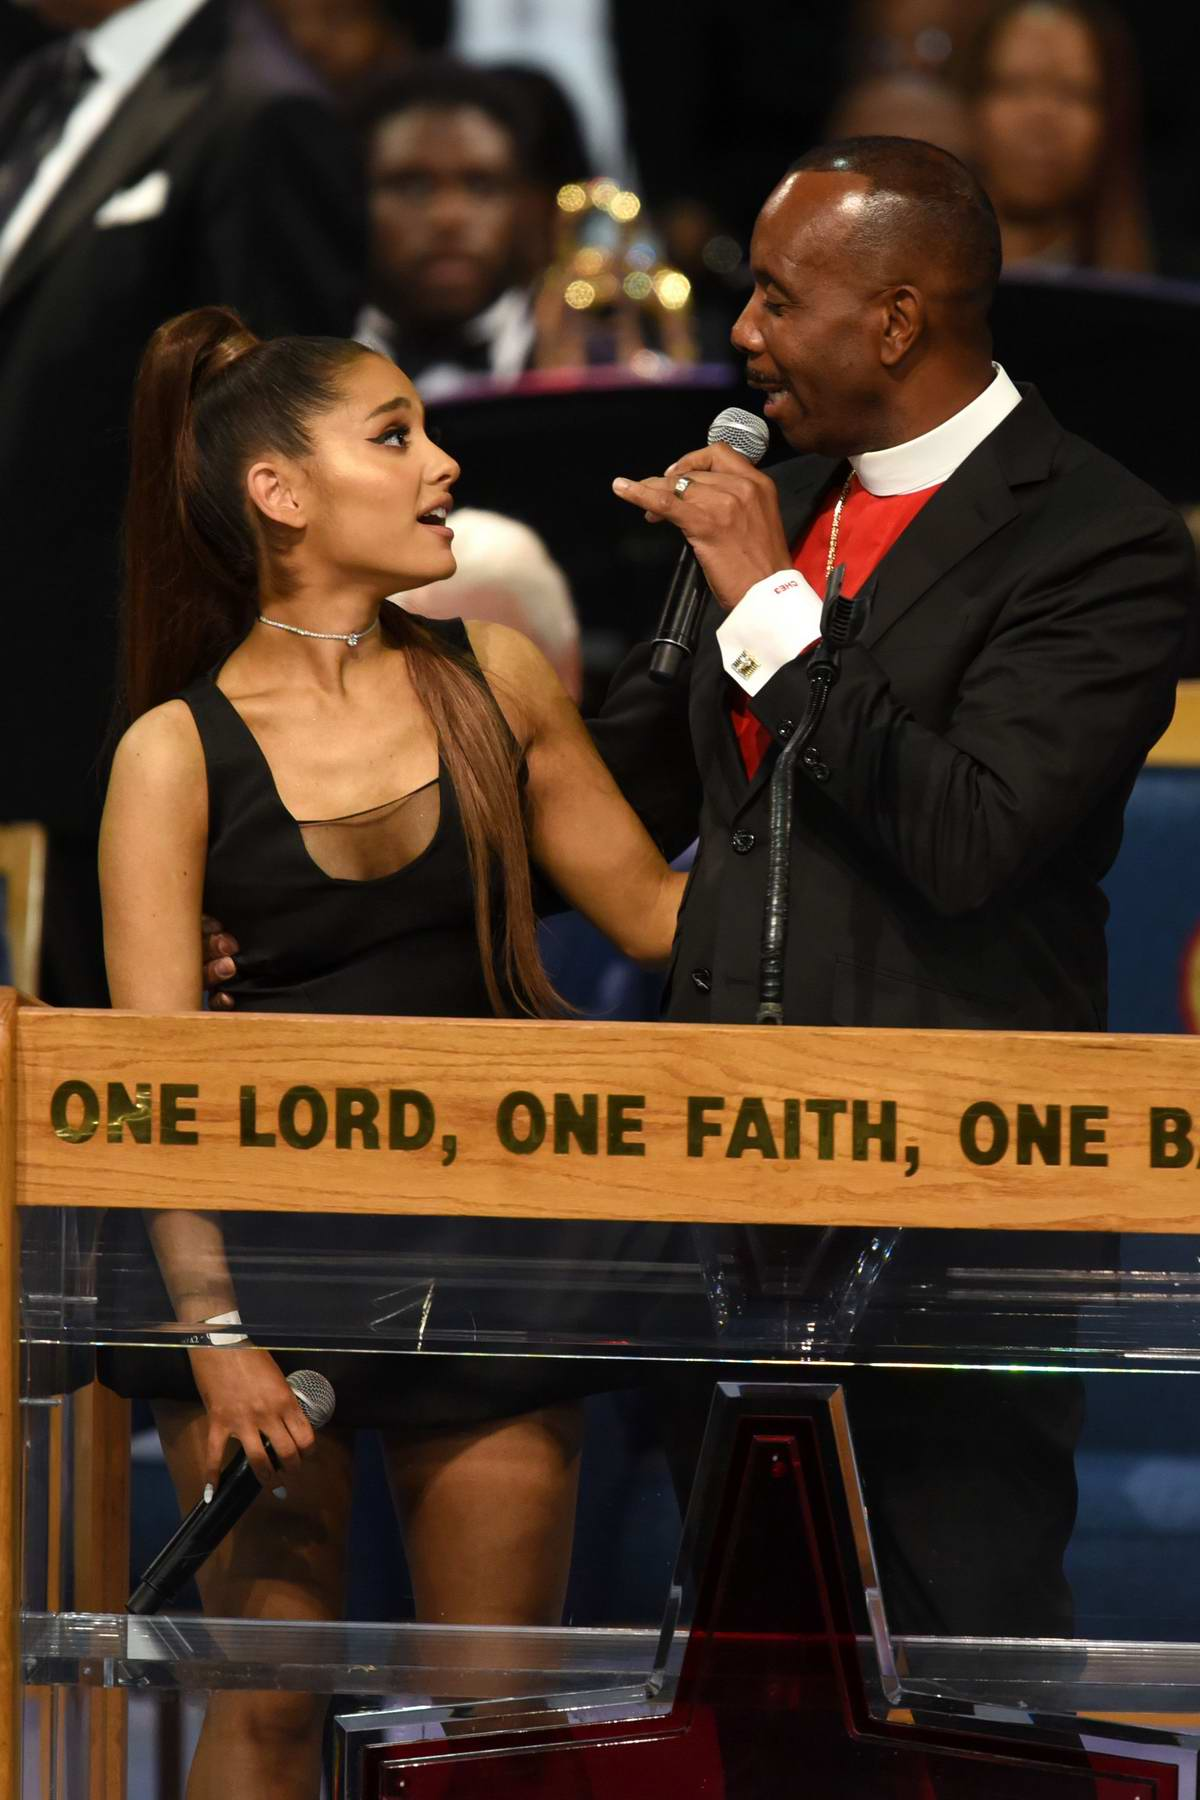 Ariana Grande attending Aretha Franklin's funeral in Detroit, Michigan